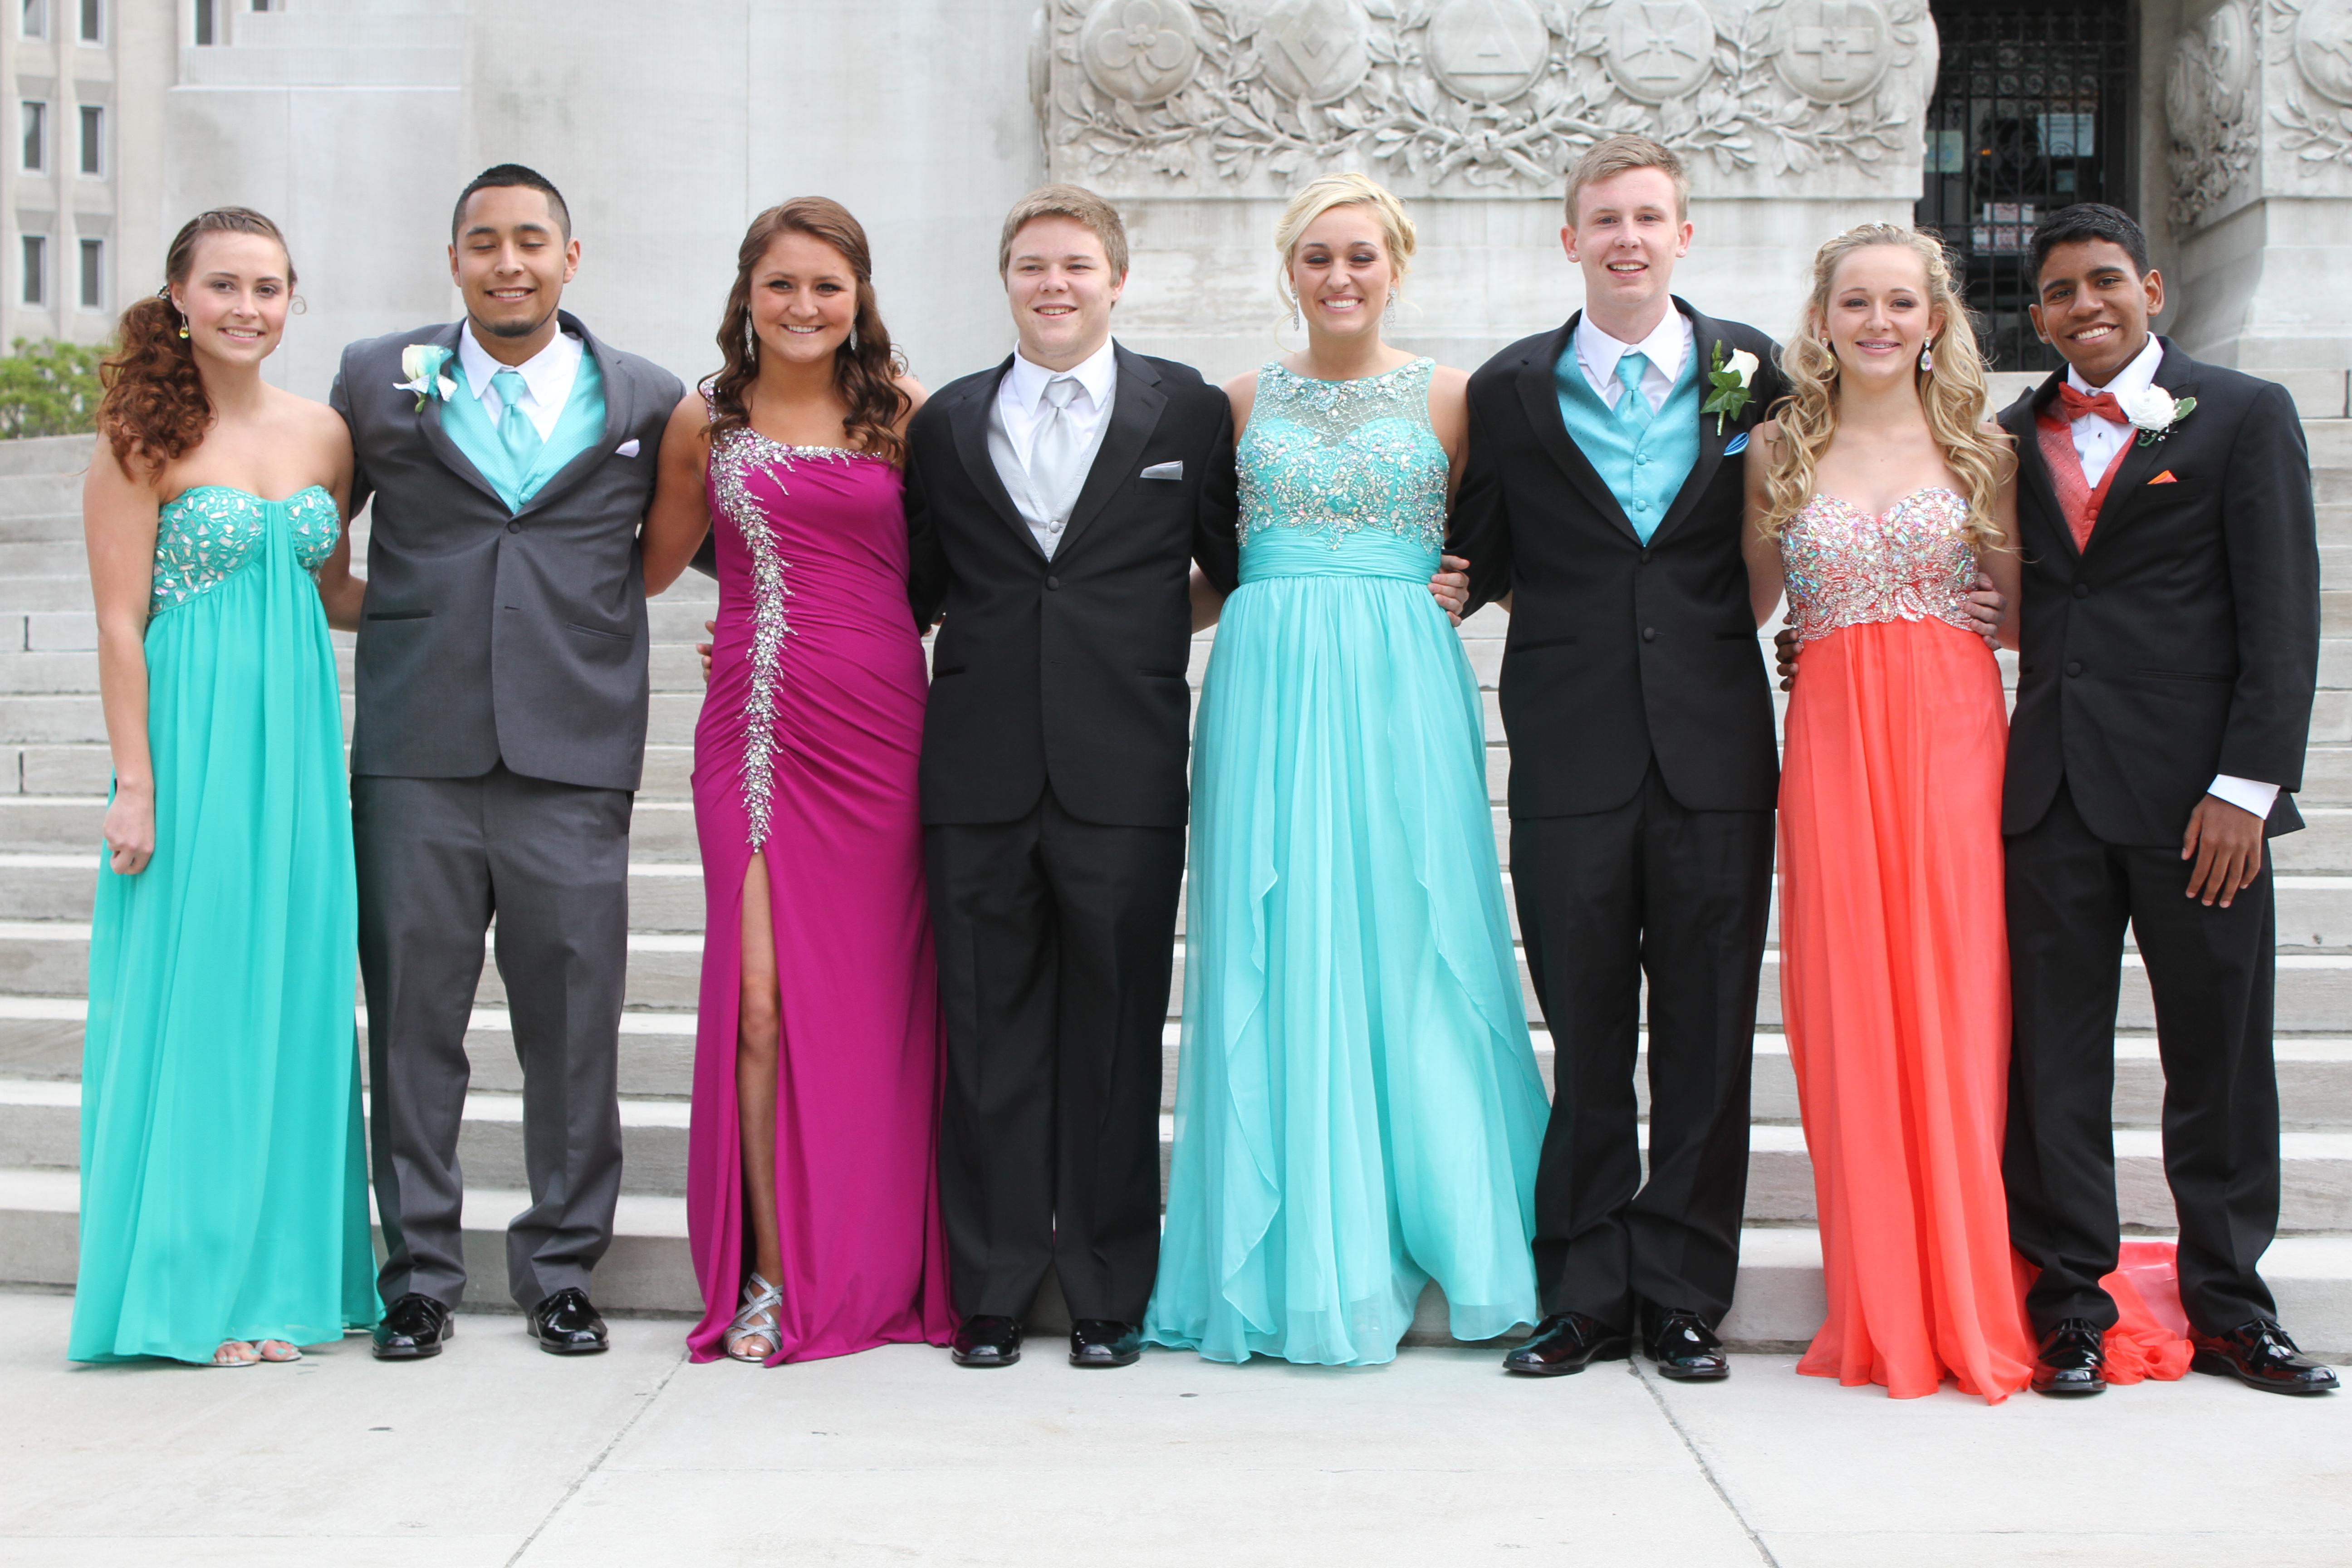 Prom 2014-Avon High School Junior/Senior Prom | Katelynne Newton